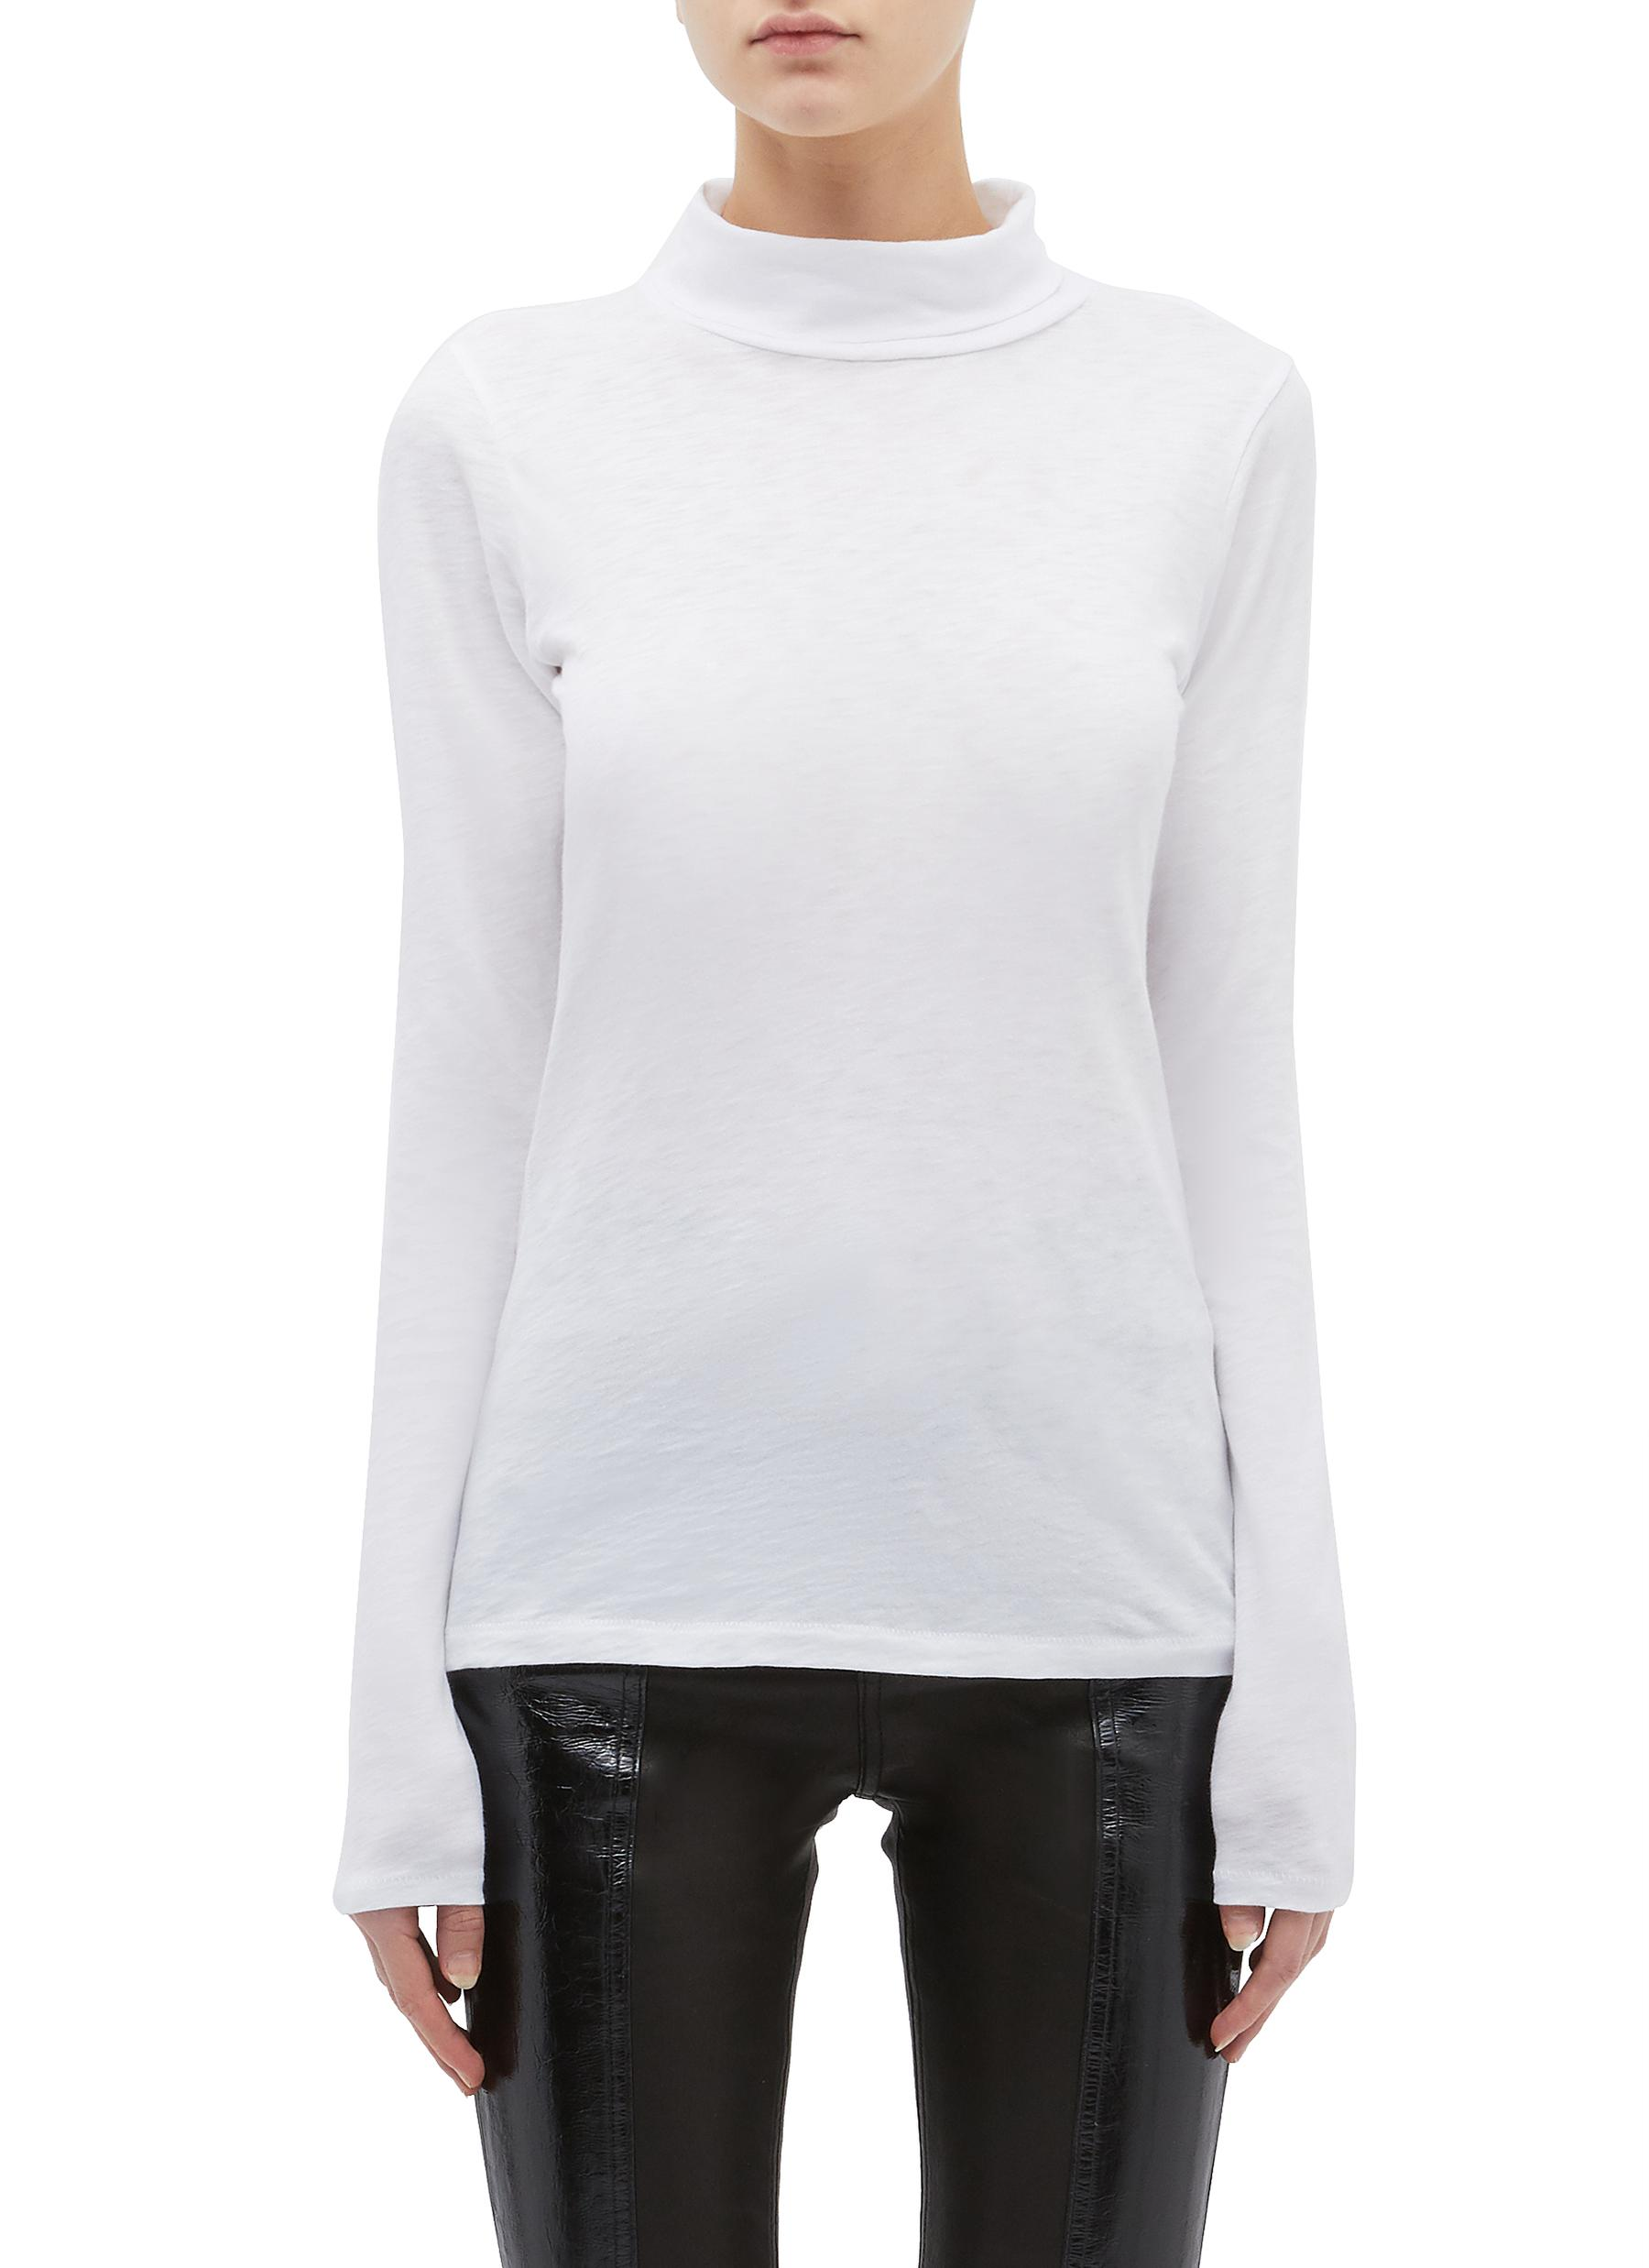 Pima cotton long sleeve turtleneck T-shirt by Rag & Bone/Jean